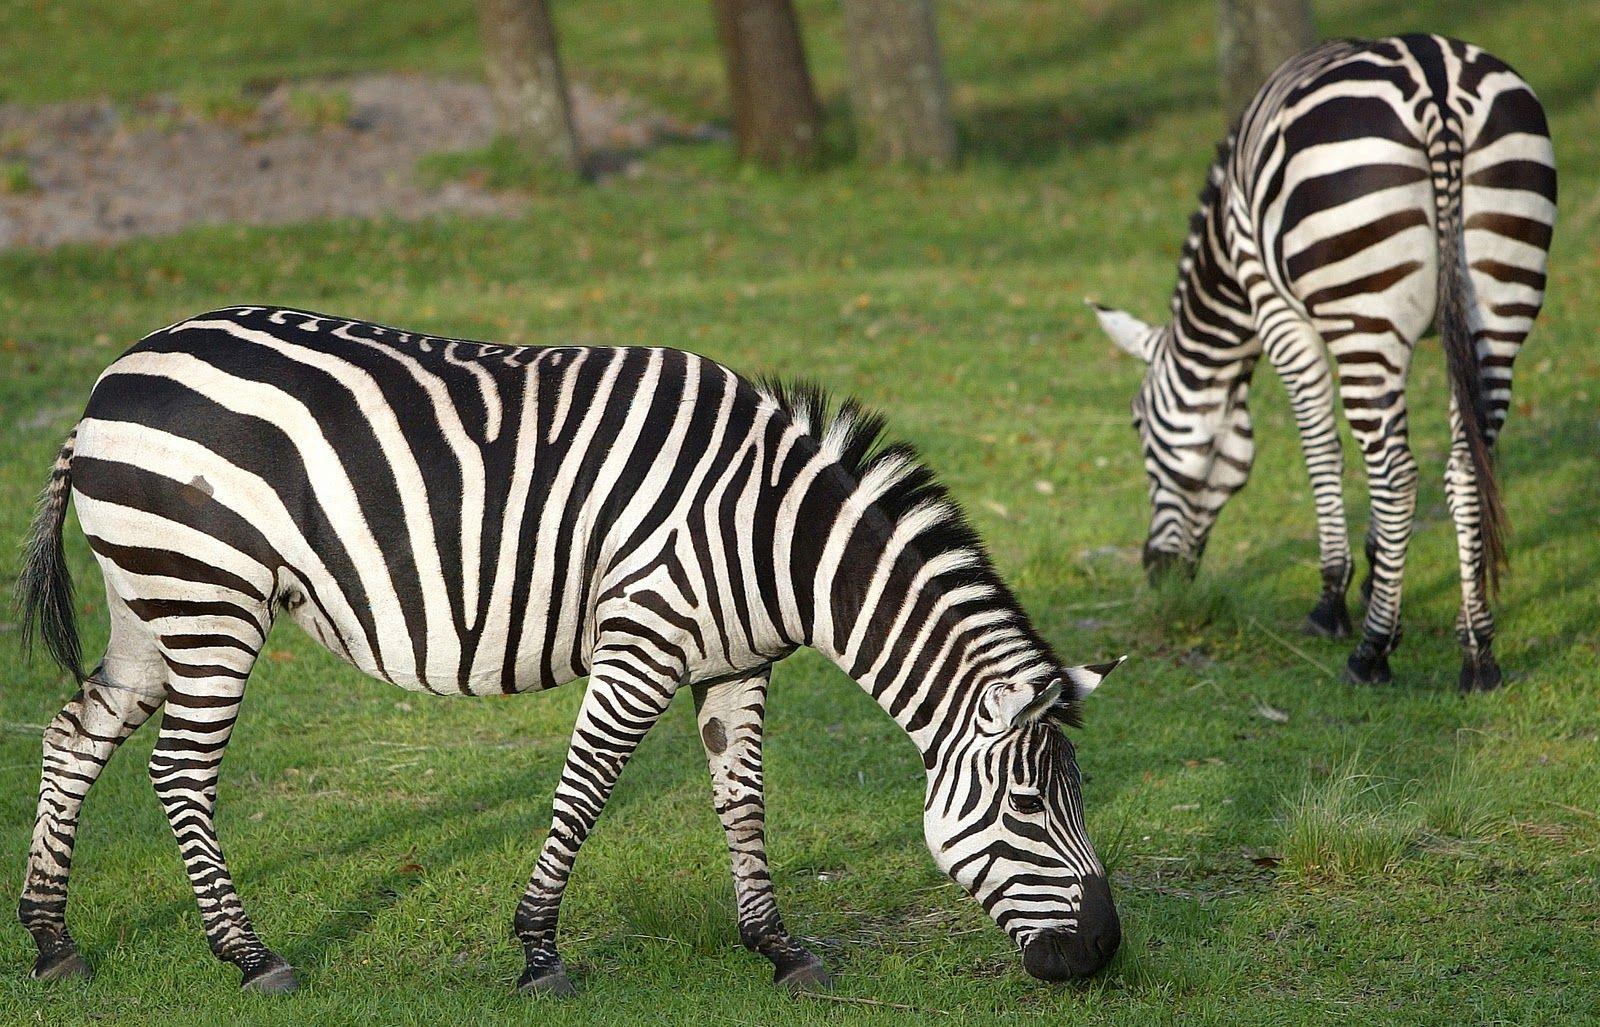 zebra species images zebras zebras amazing facts animals